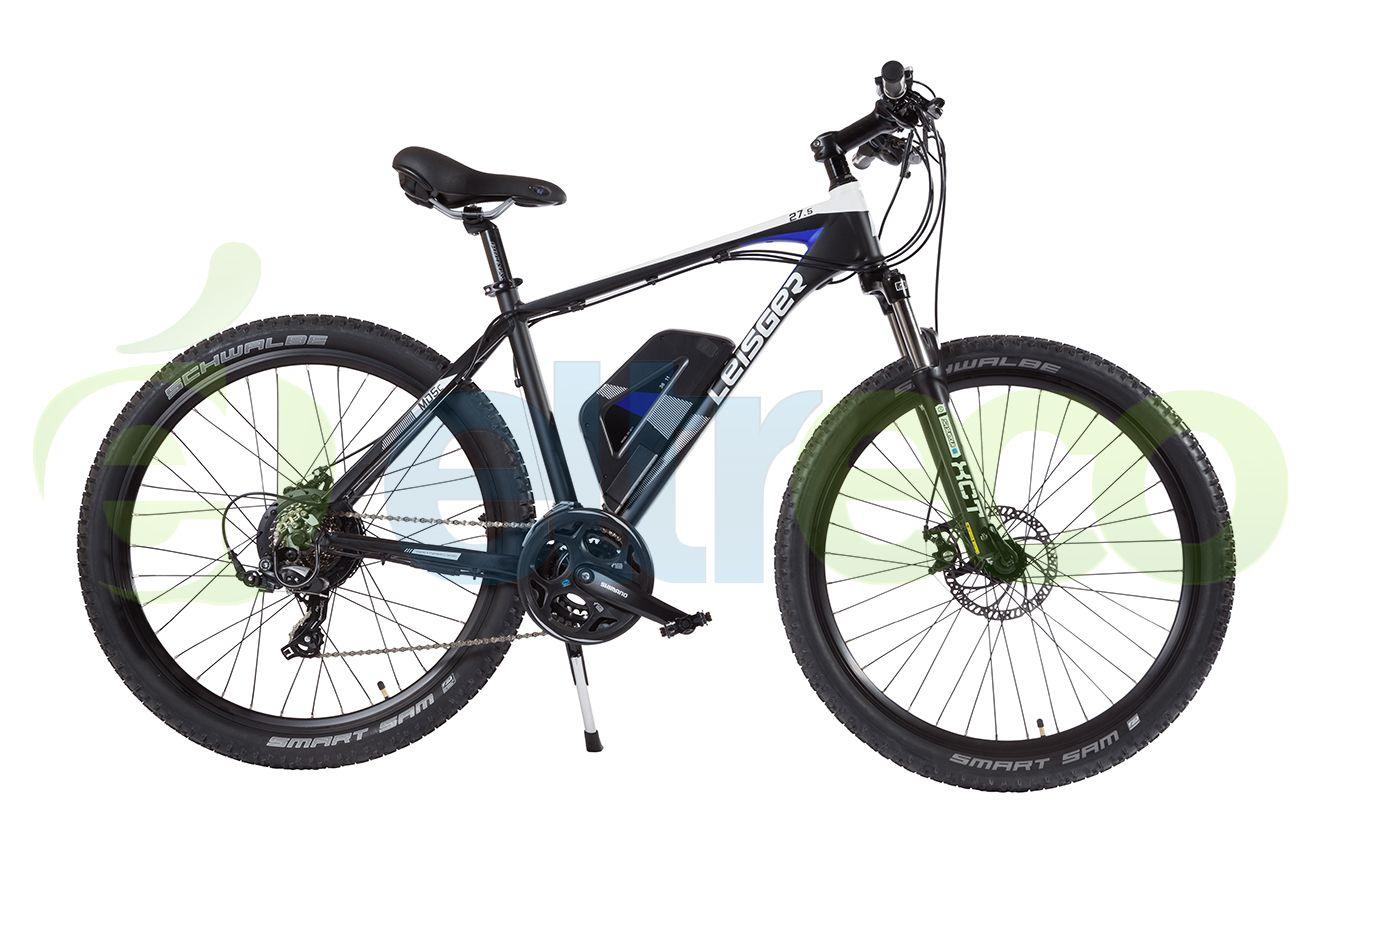 цена на Велосипед Eltreco Leisger MD5 Basic 27,5 2016